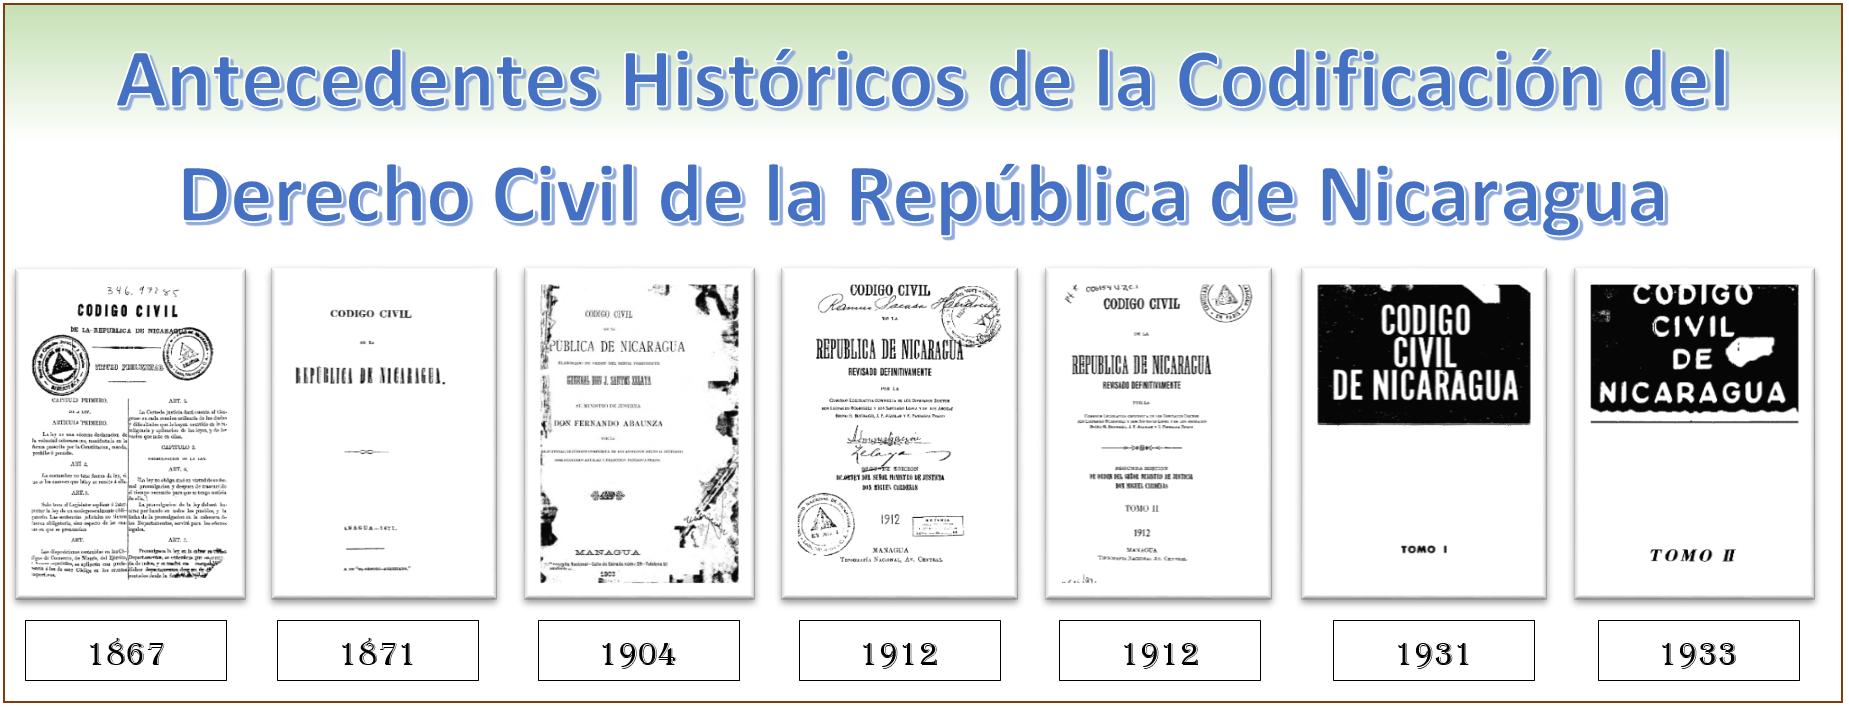 Antecedentes Históricos del Código Civil